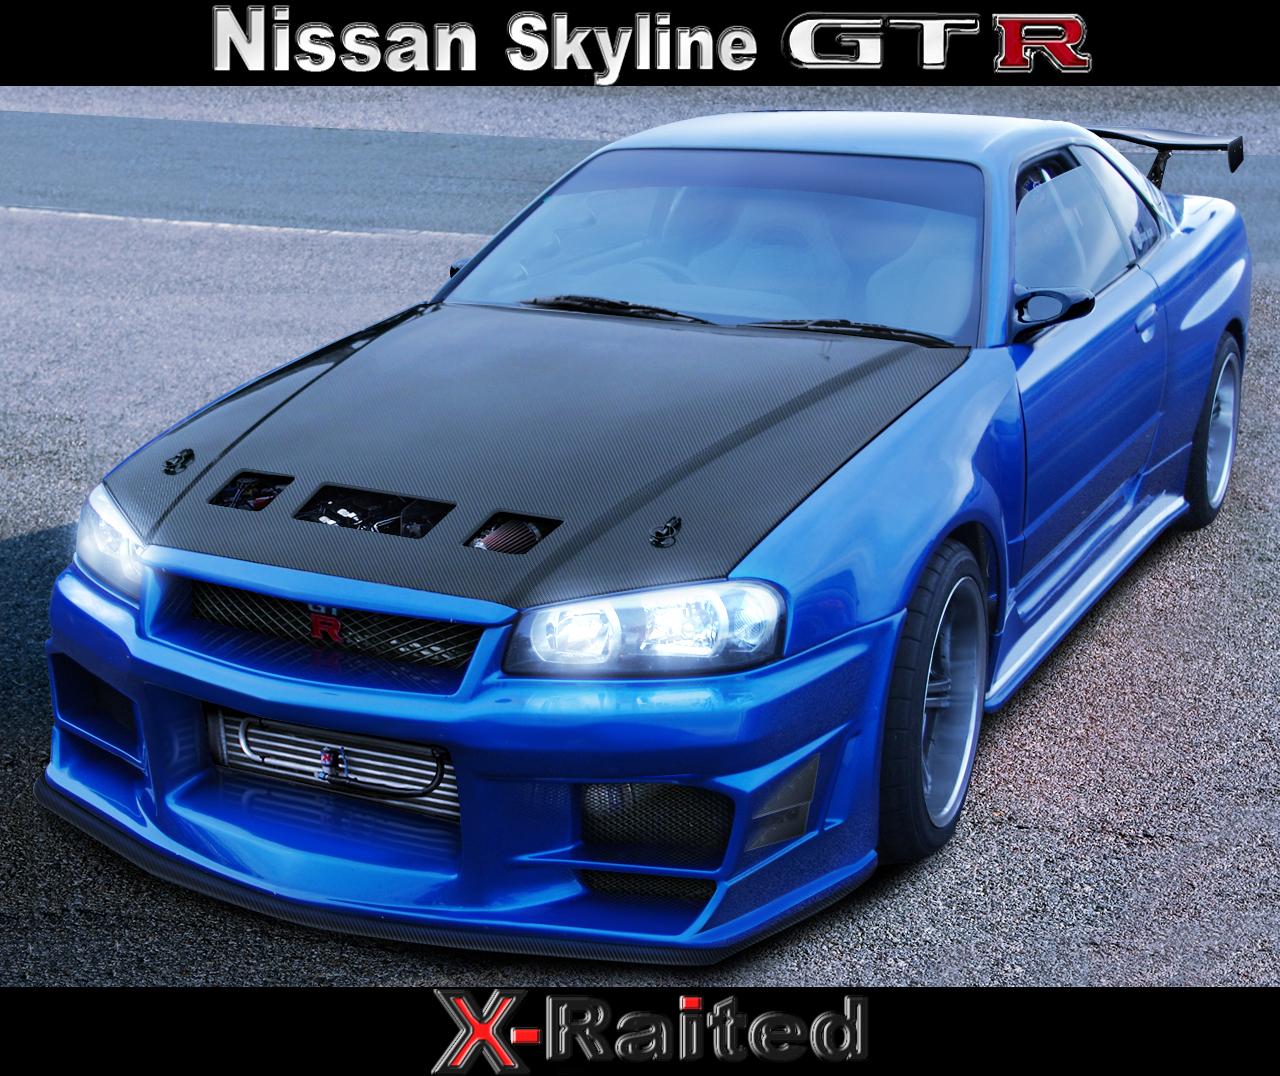 Cool Img Max: Nissan Skyline Gtr R34 Wallpaper